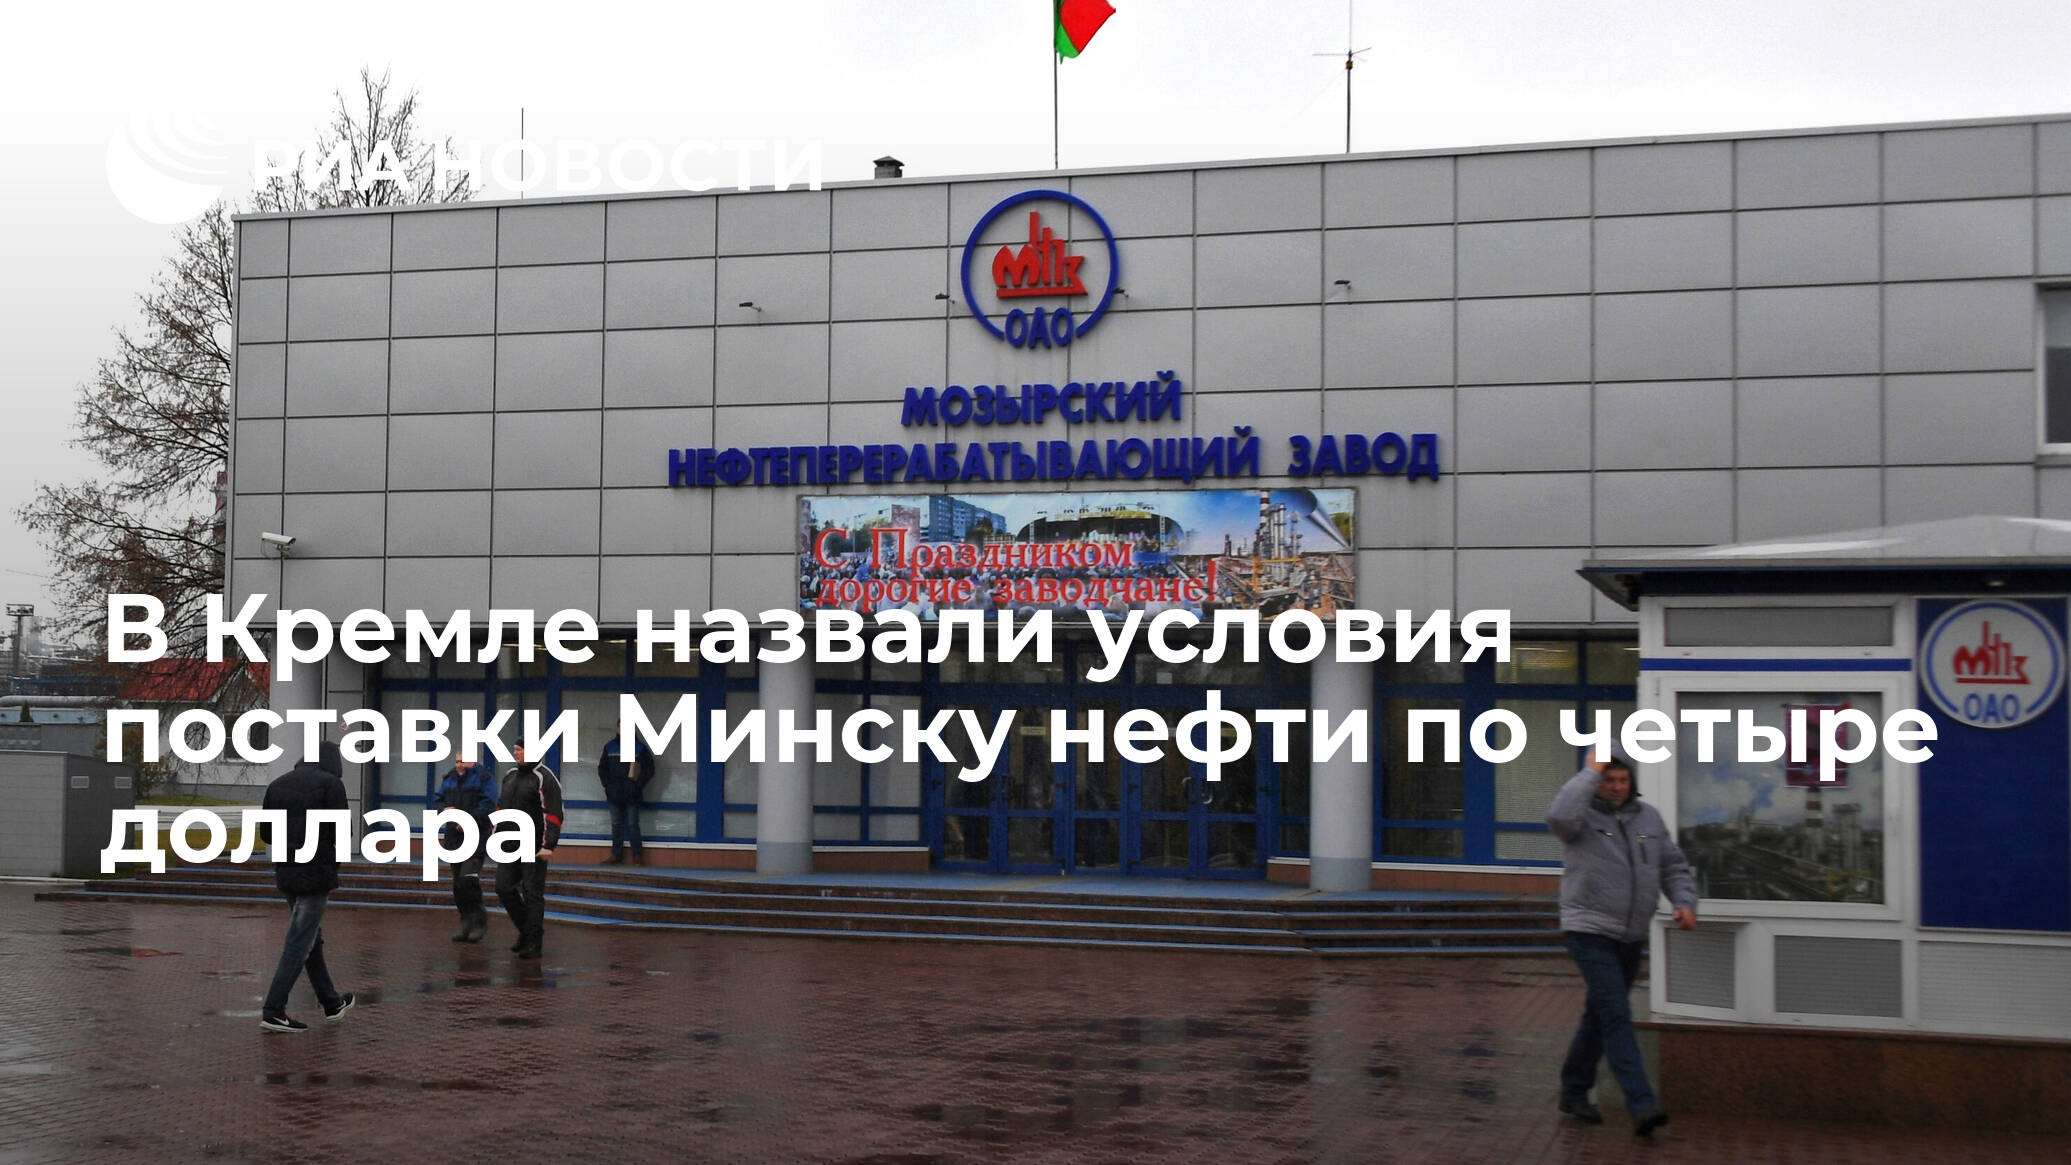 В Кремле назвали условия поставки Минску нефти по четыре доллара